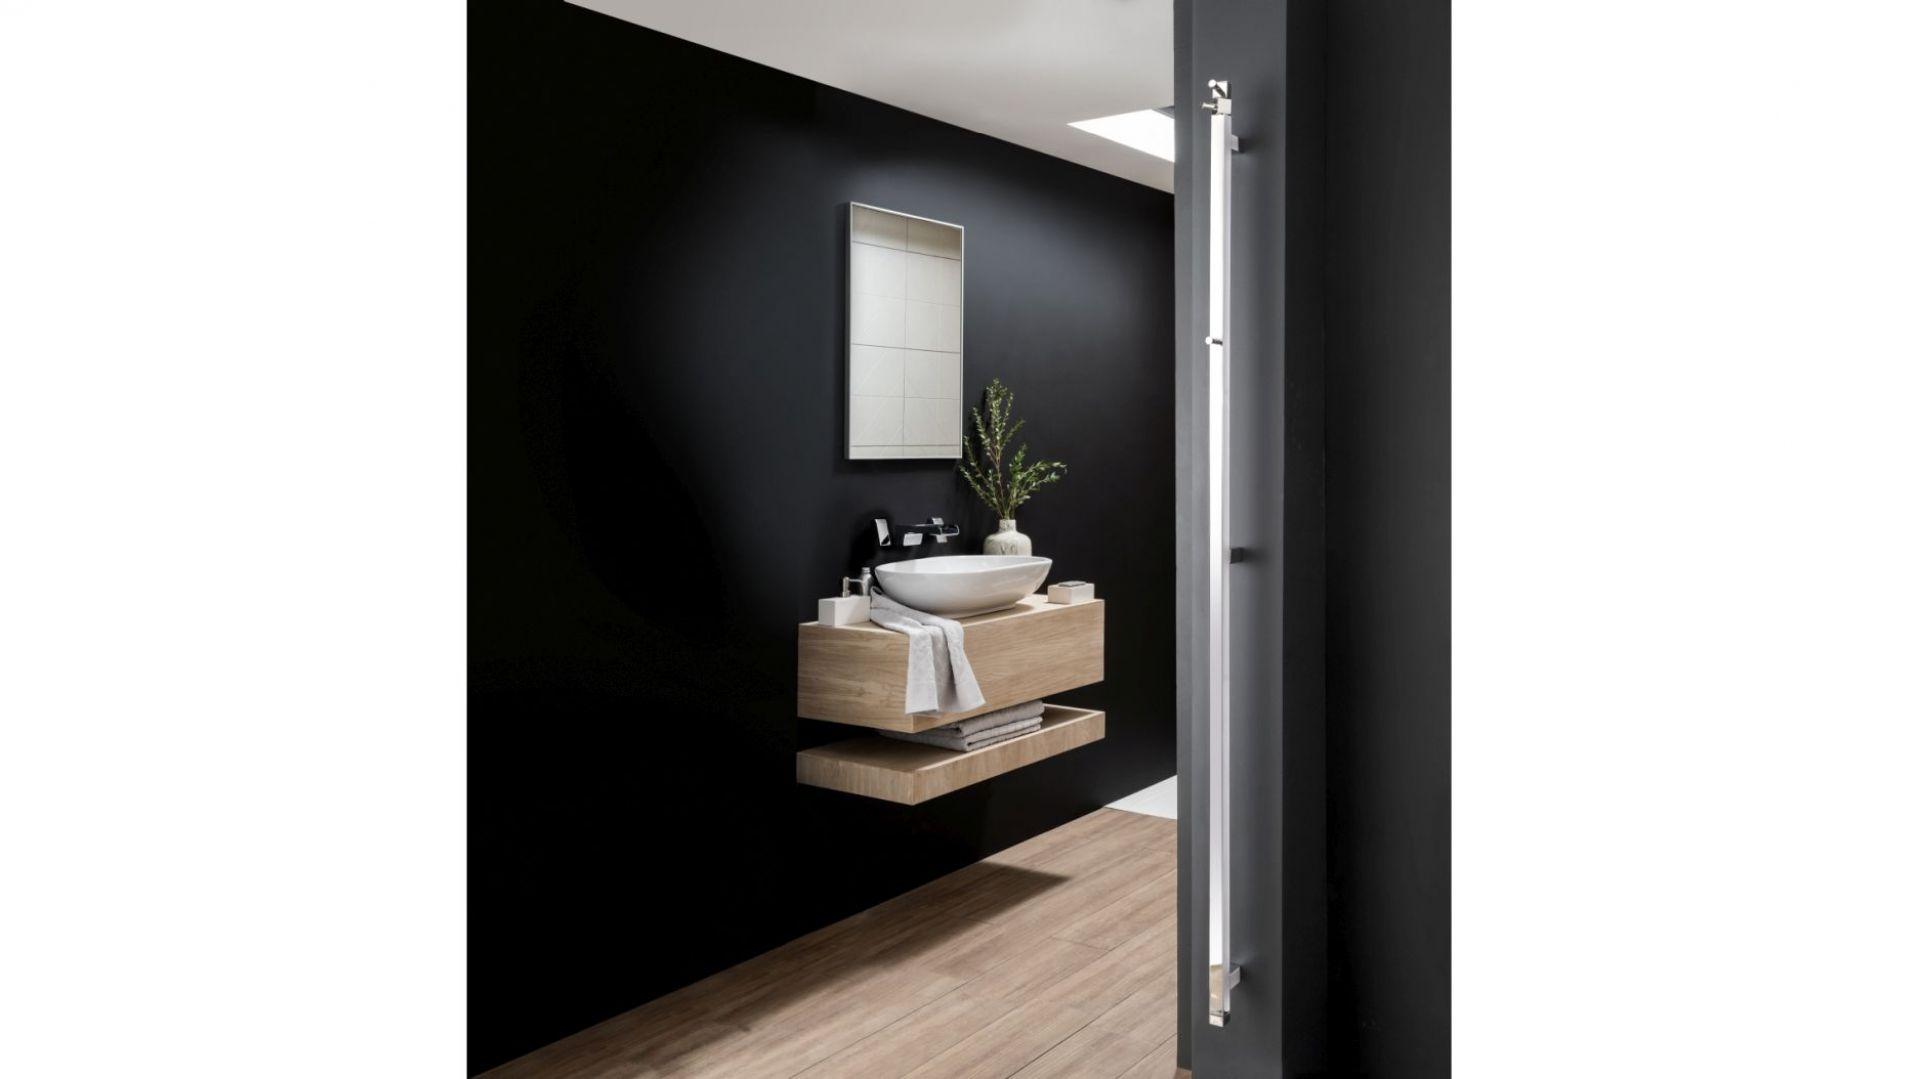 EL045 Simplicity II Square/Vogue UK. Produkt zgłoszony do konkursu Dobry Design 2019.